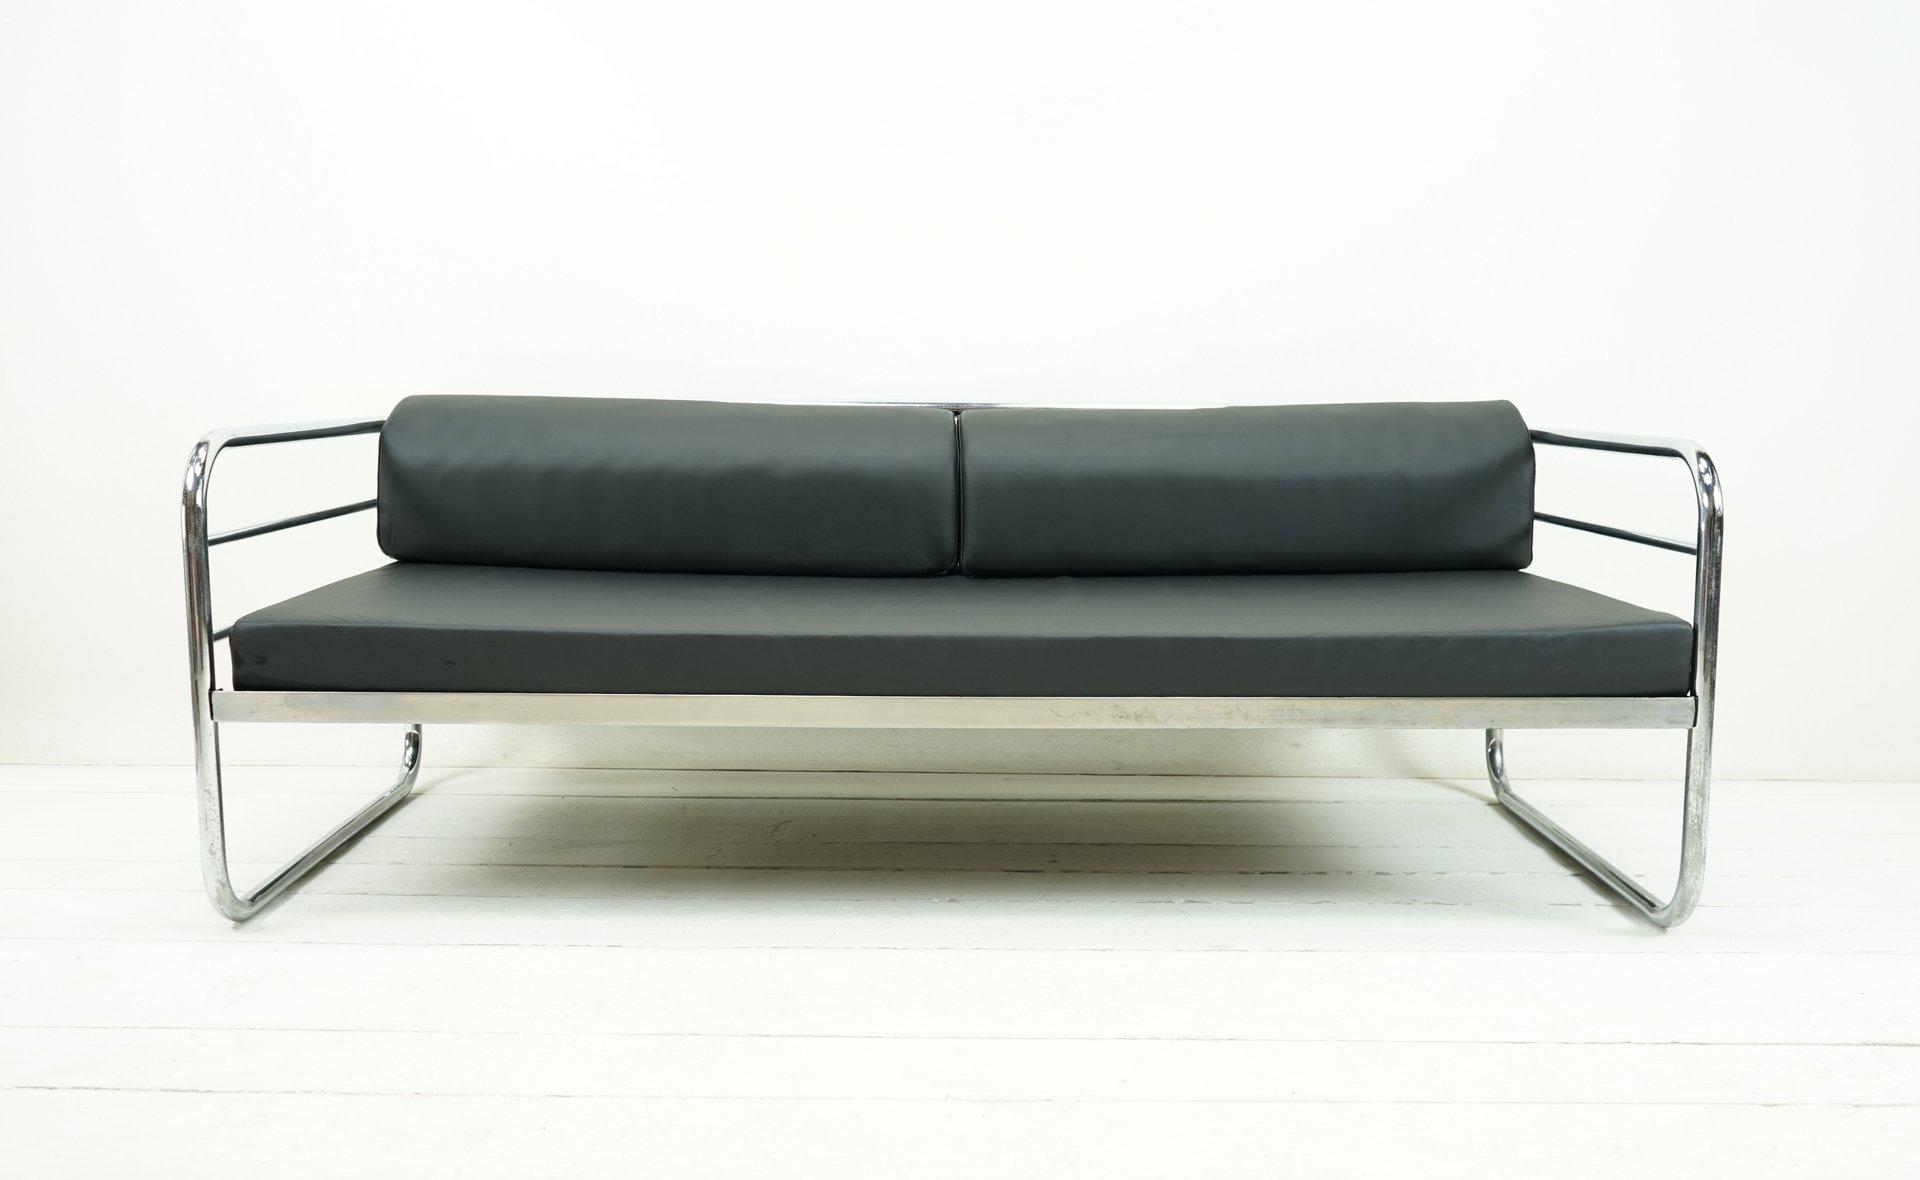 lc5 sofa review ikea futon bed bauhaus le 3 seater black premium